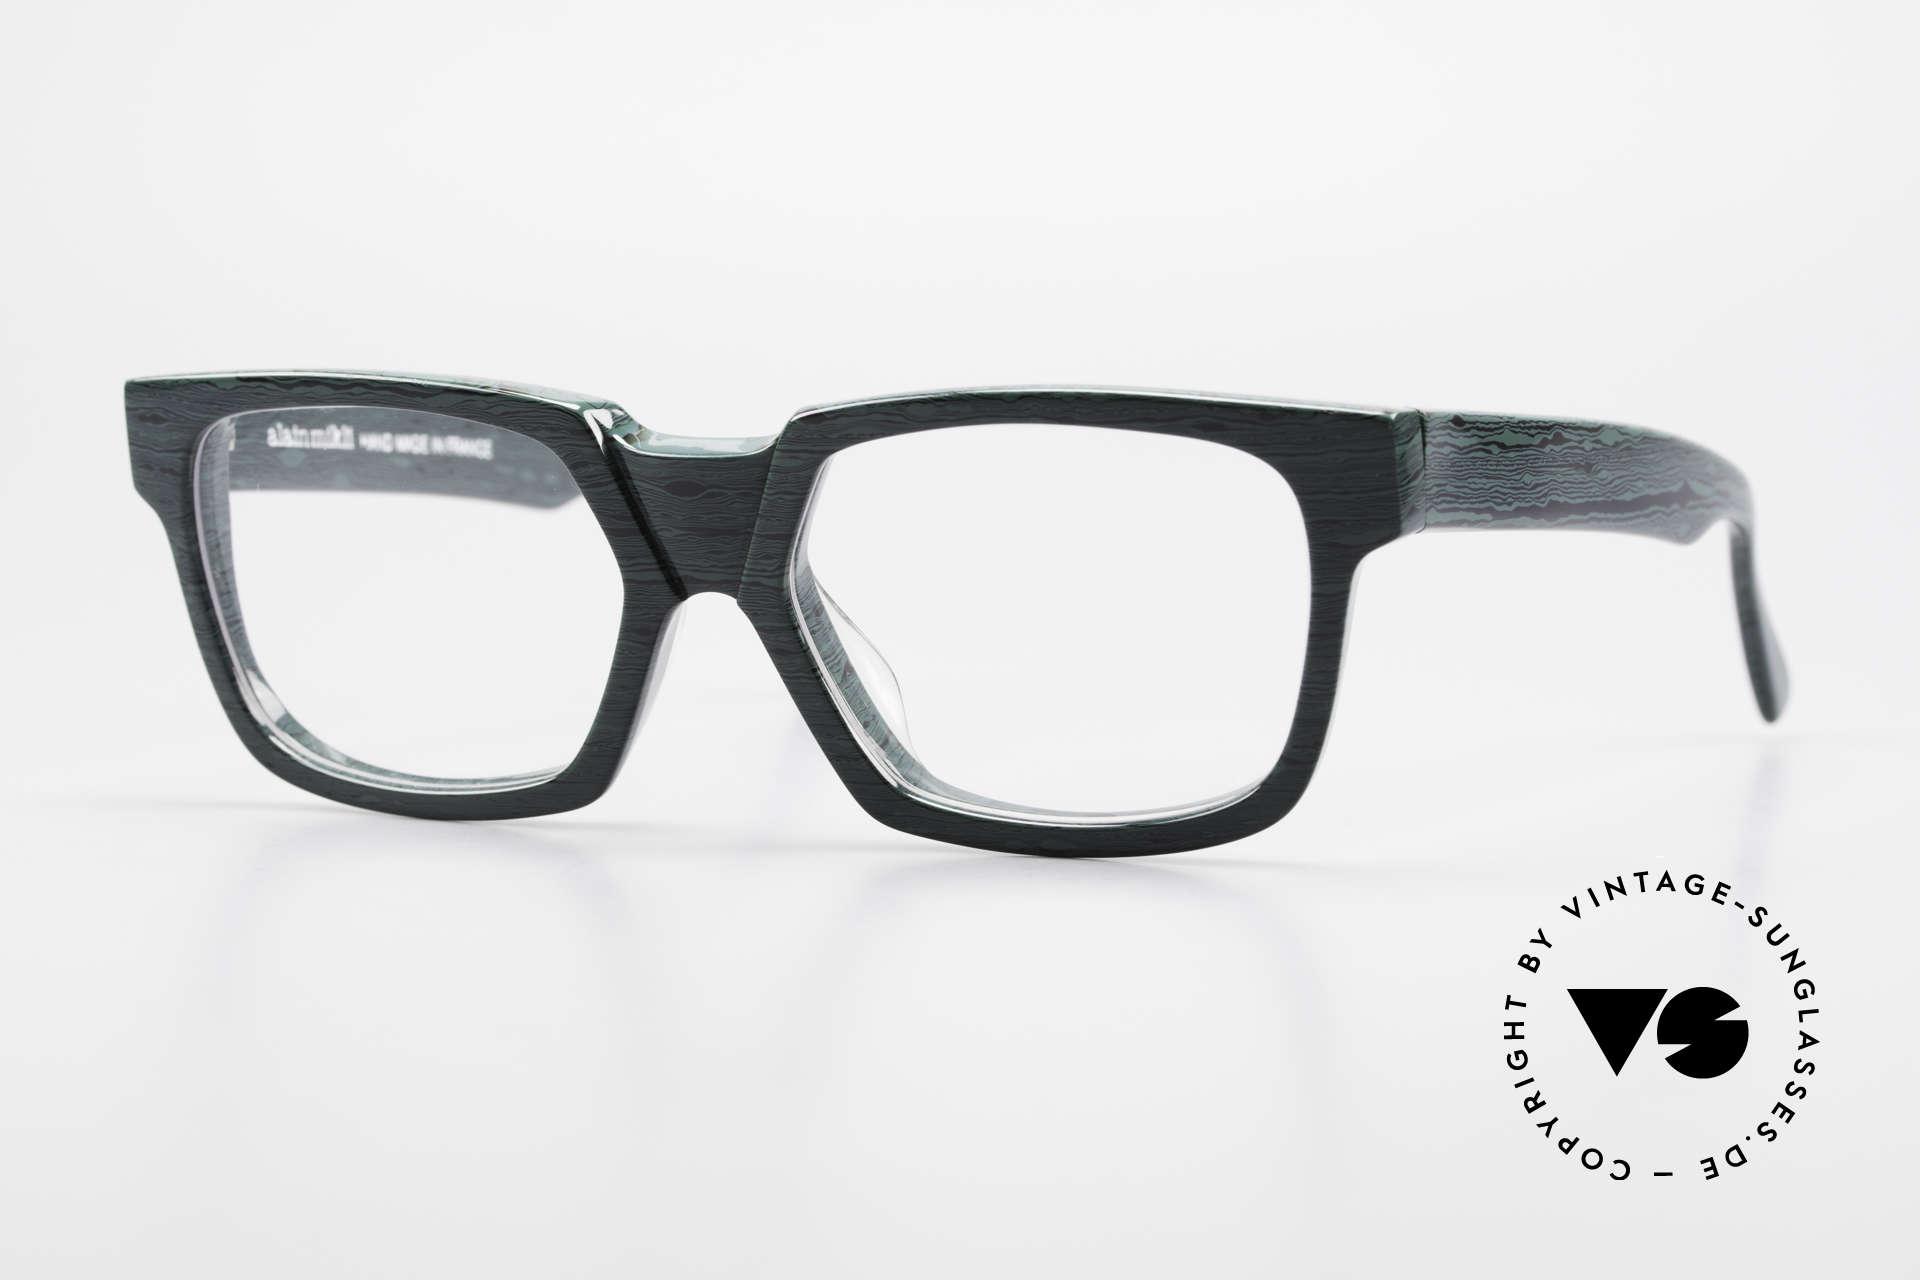 Alain Mikli 0143 / 285 Striking 1980's Eyeglasses, vintage ALAIN MIKLI designer eyeglasses from 1988, Made for Men and Women